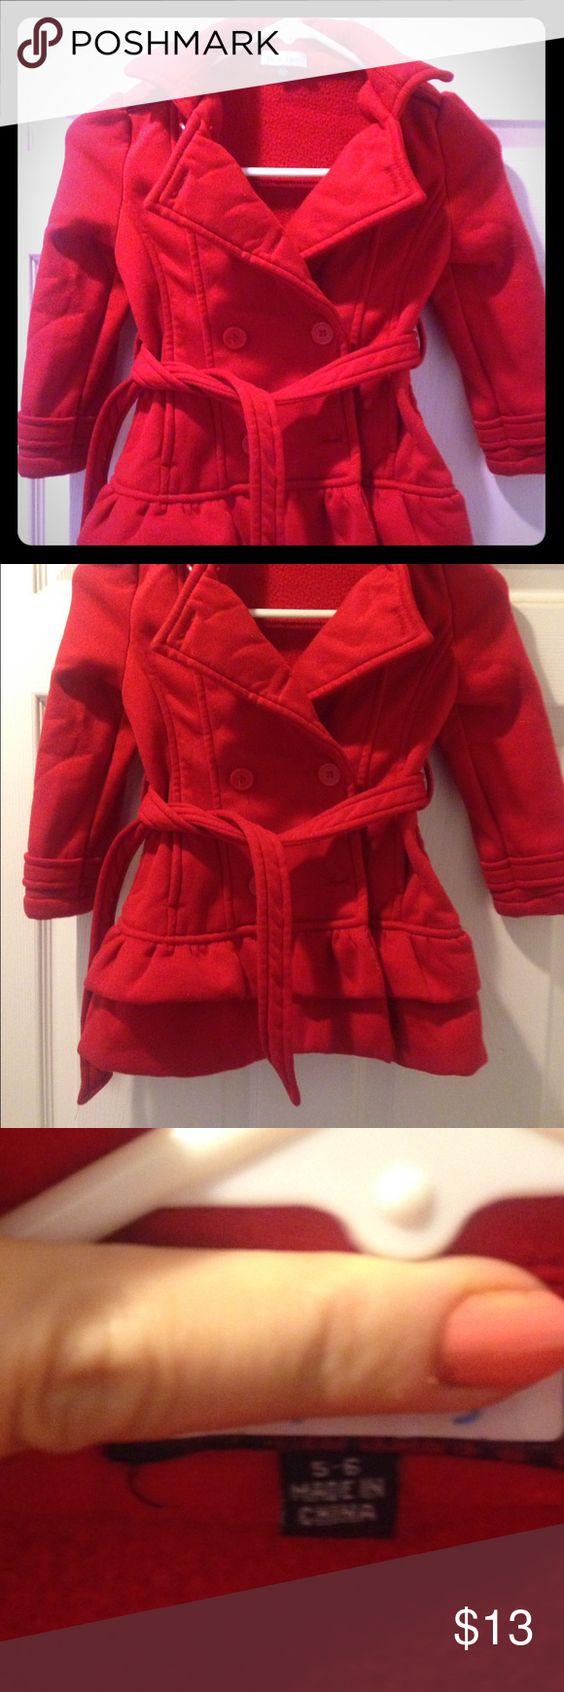 Girls red pea coat fleece 5/6 Adorable red pea coat fleece material very warm size 5/6 Jackets & Coats Pea Coats